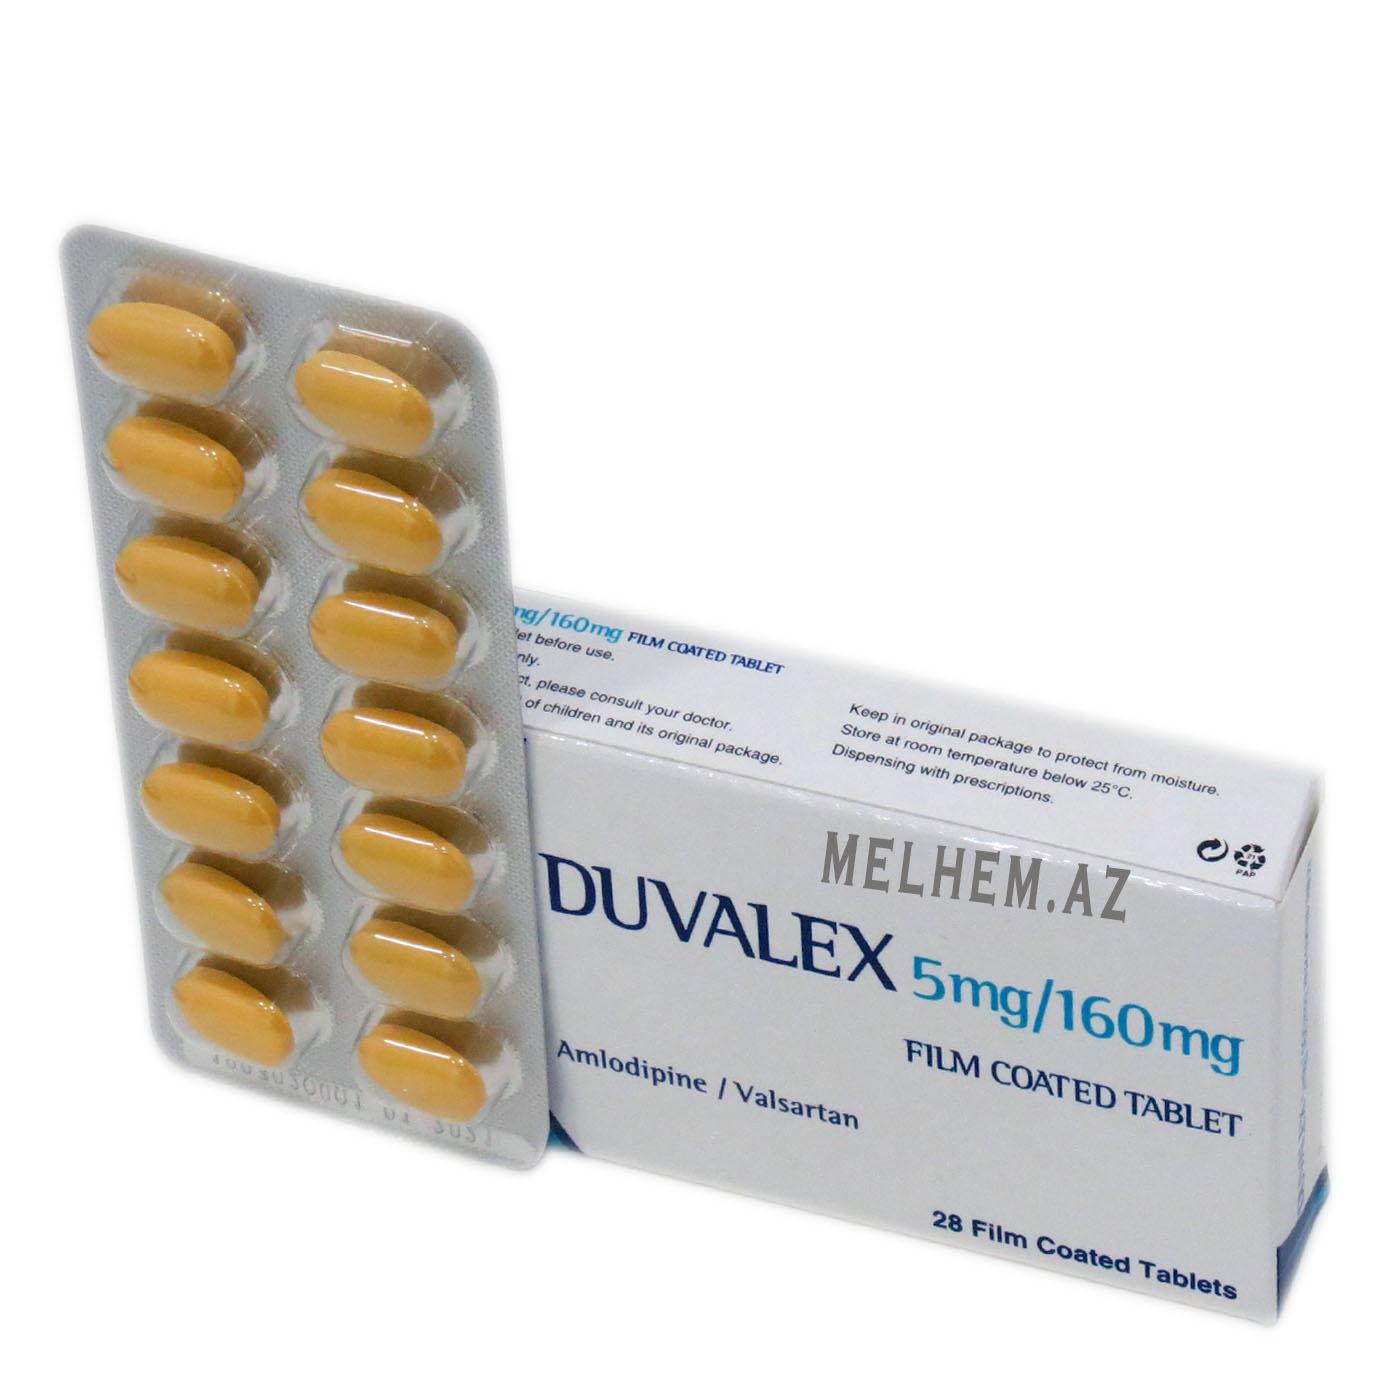 DUVALEX 5MG/160MG